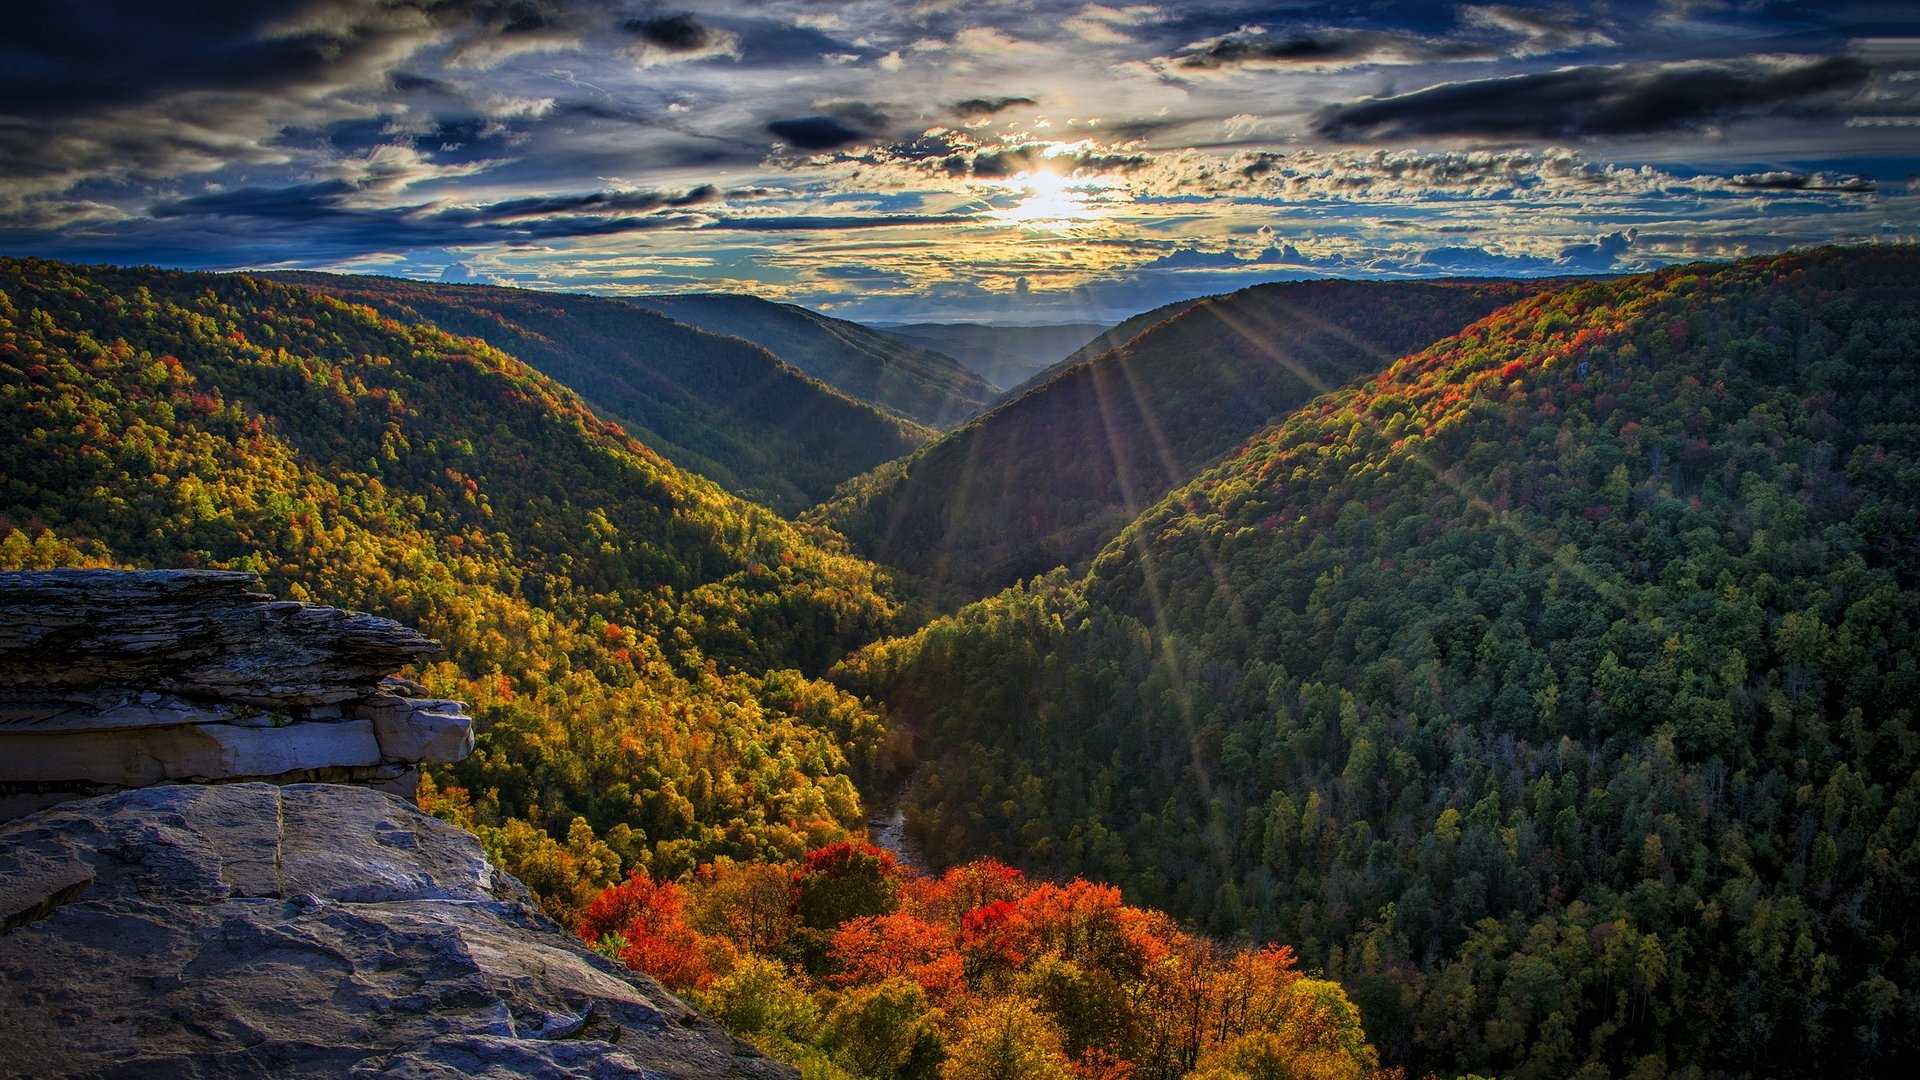 West Virginia Wallpaper Free